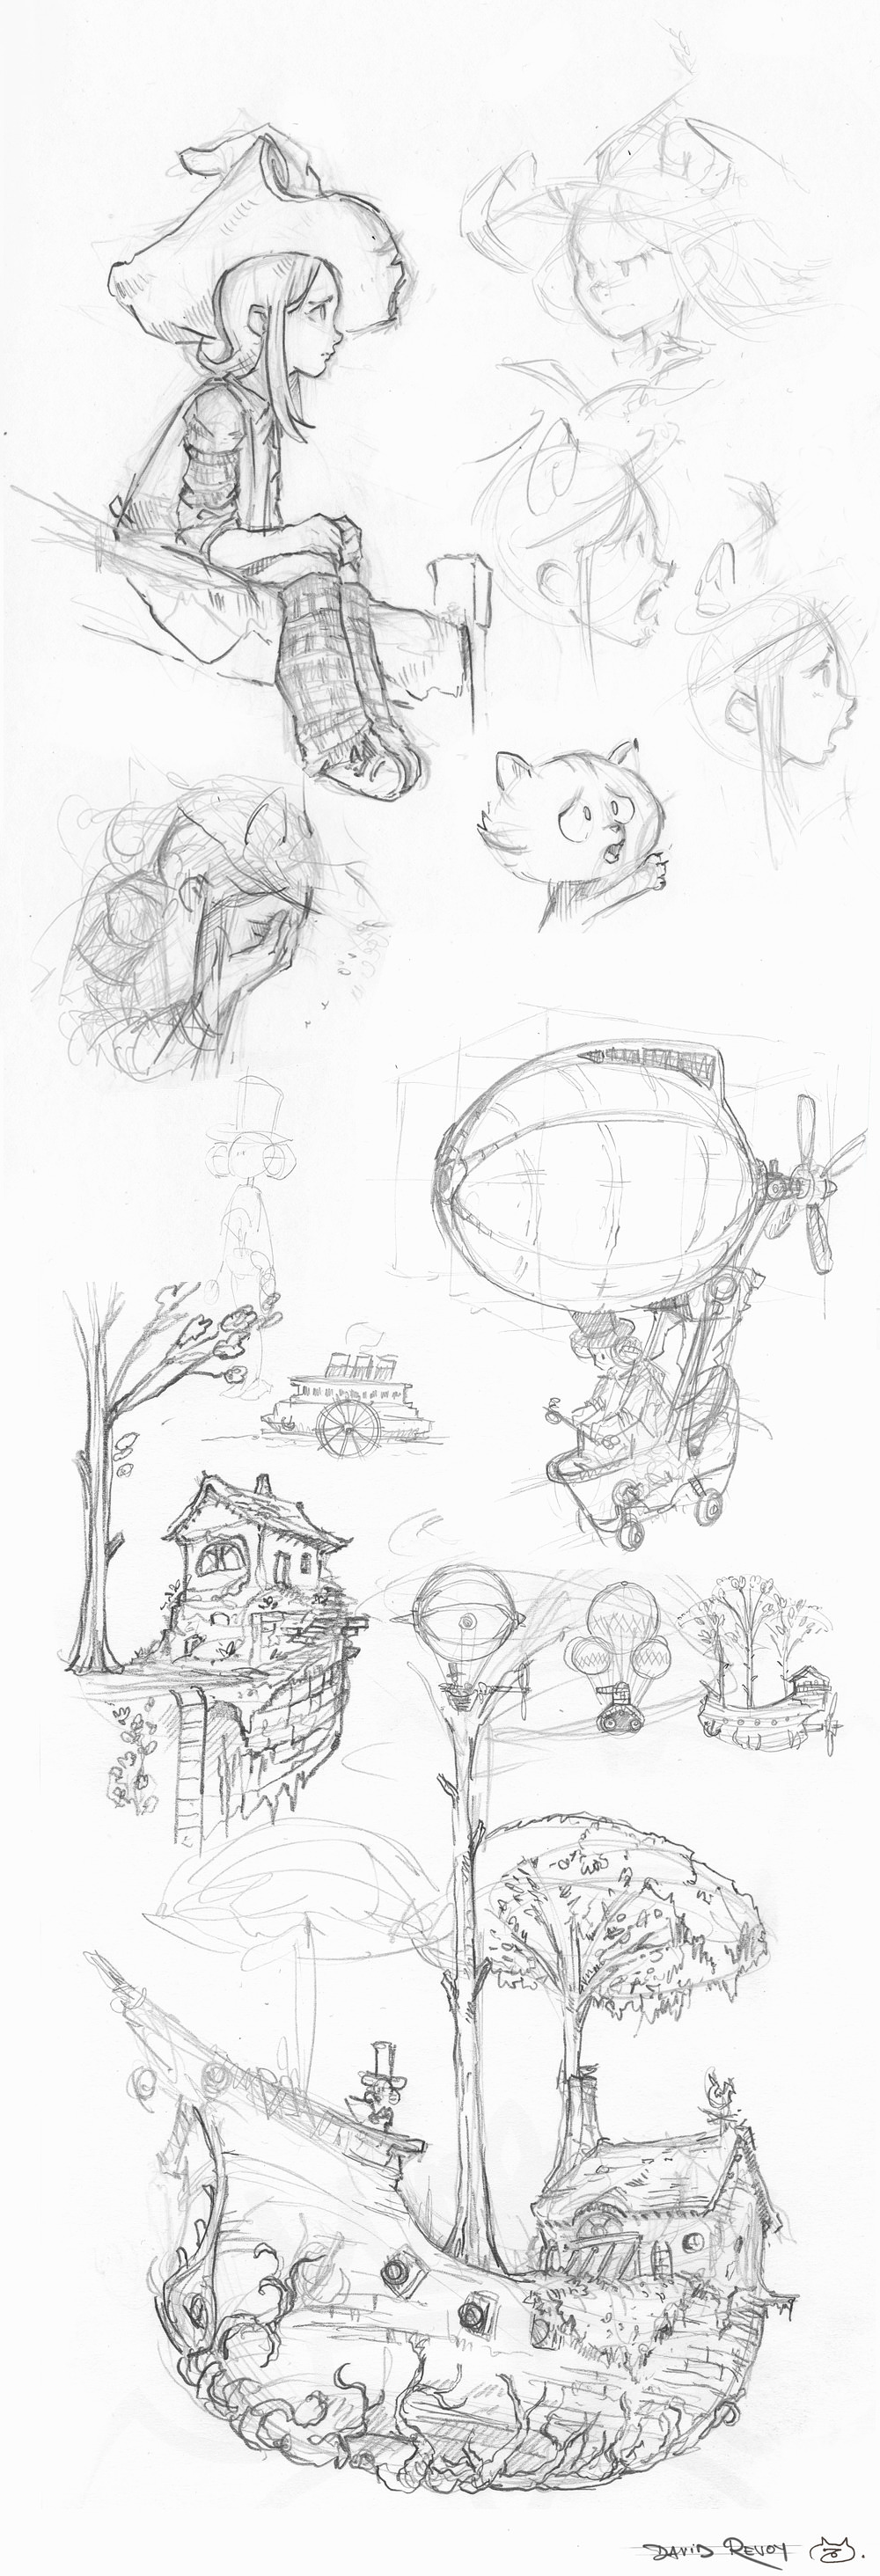 image data/images/bonus/2015-06-04_sketches_net.jpg